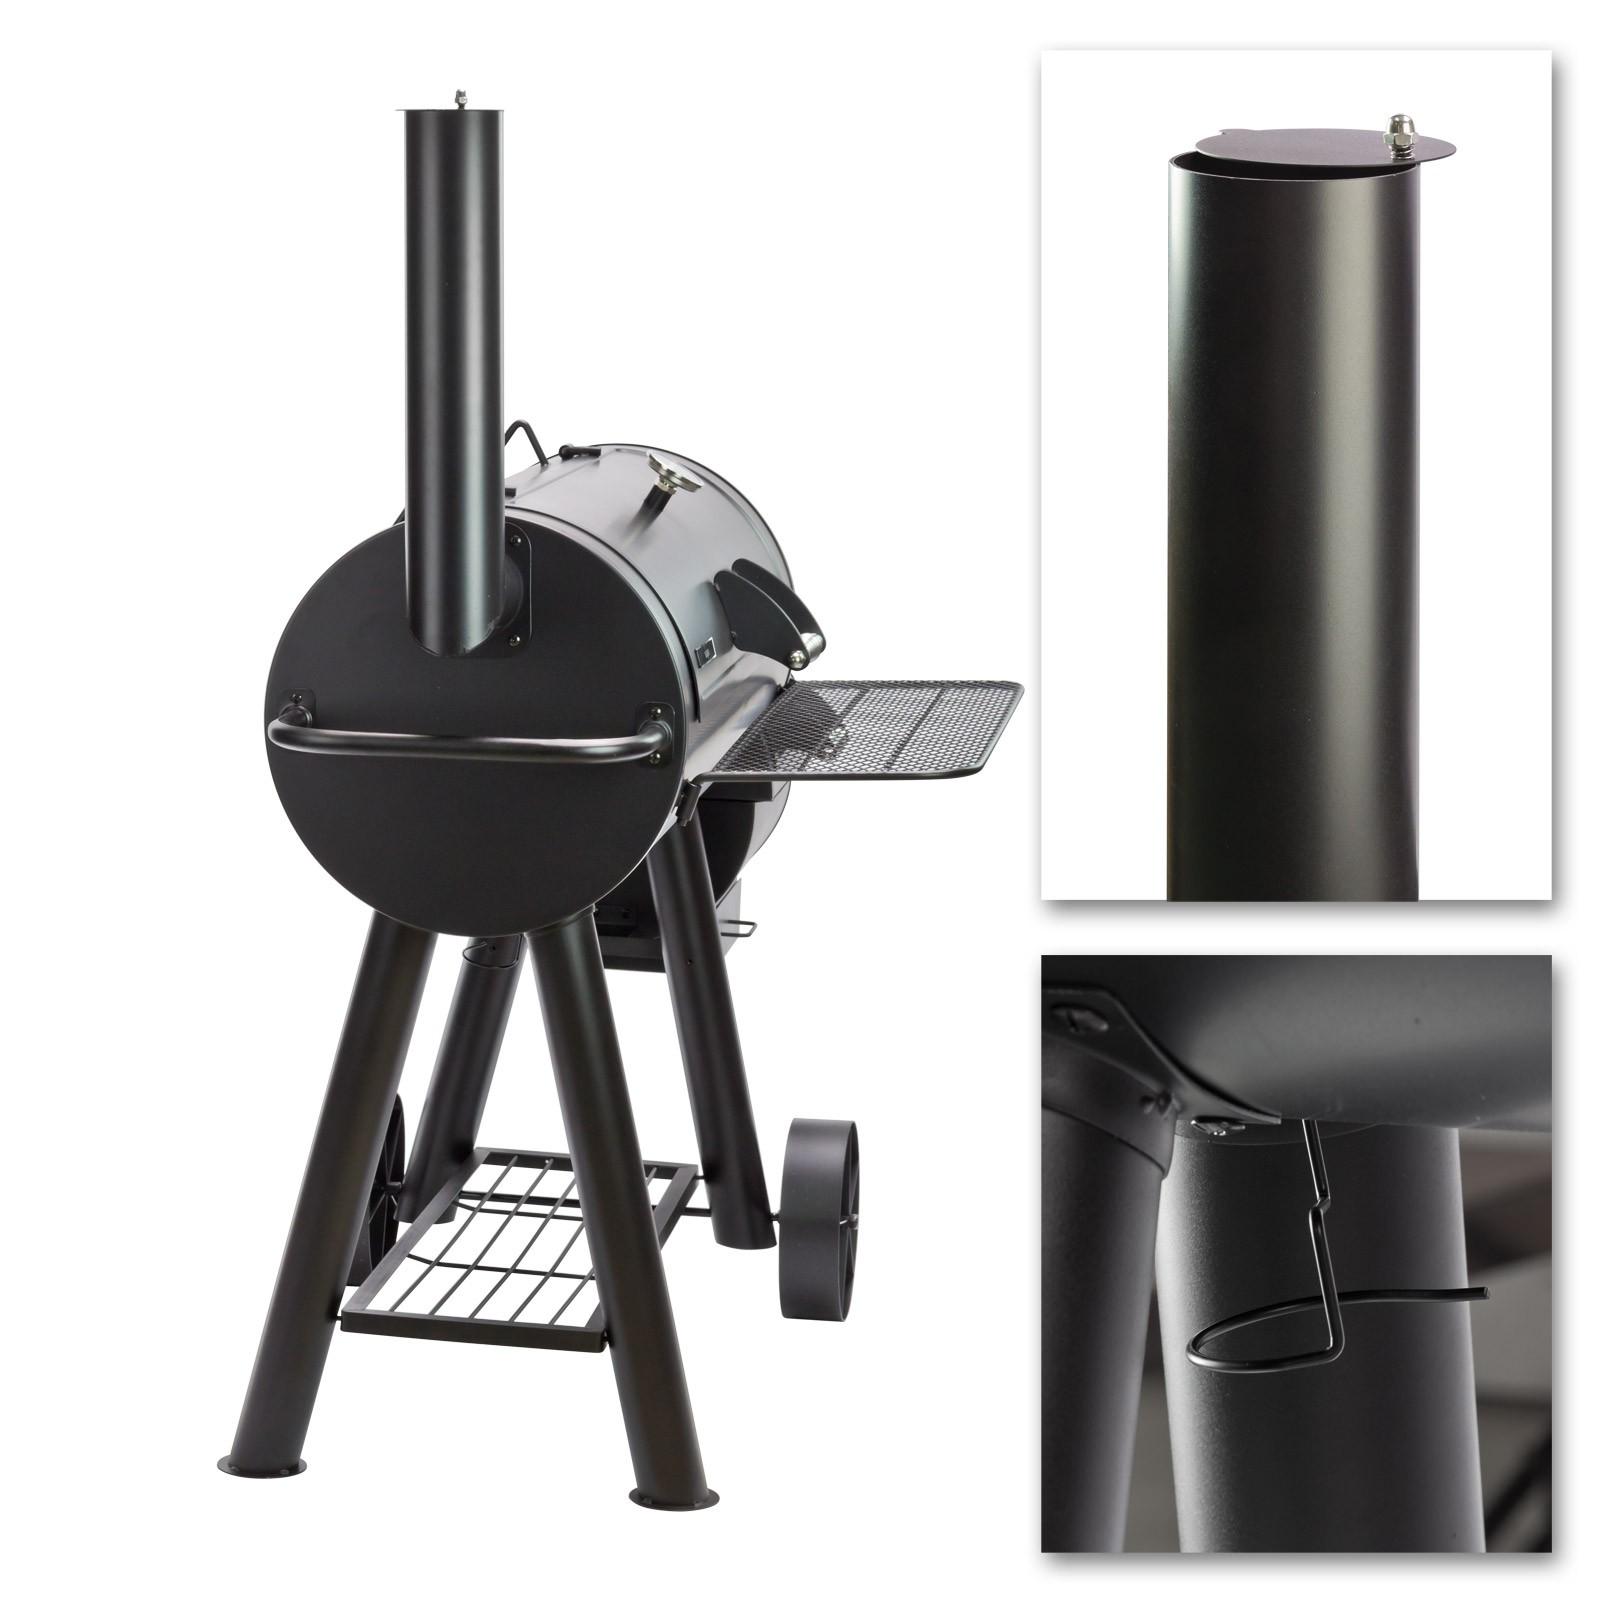 smoker grillwagen san antonio xxl 76 kg gartengrill barbecue. Black Bedroom Furniture Sets. Home Design Ideas